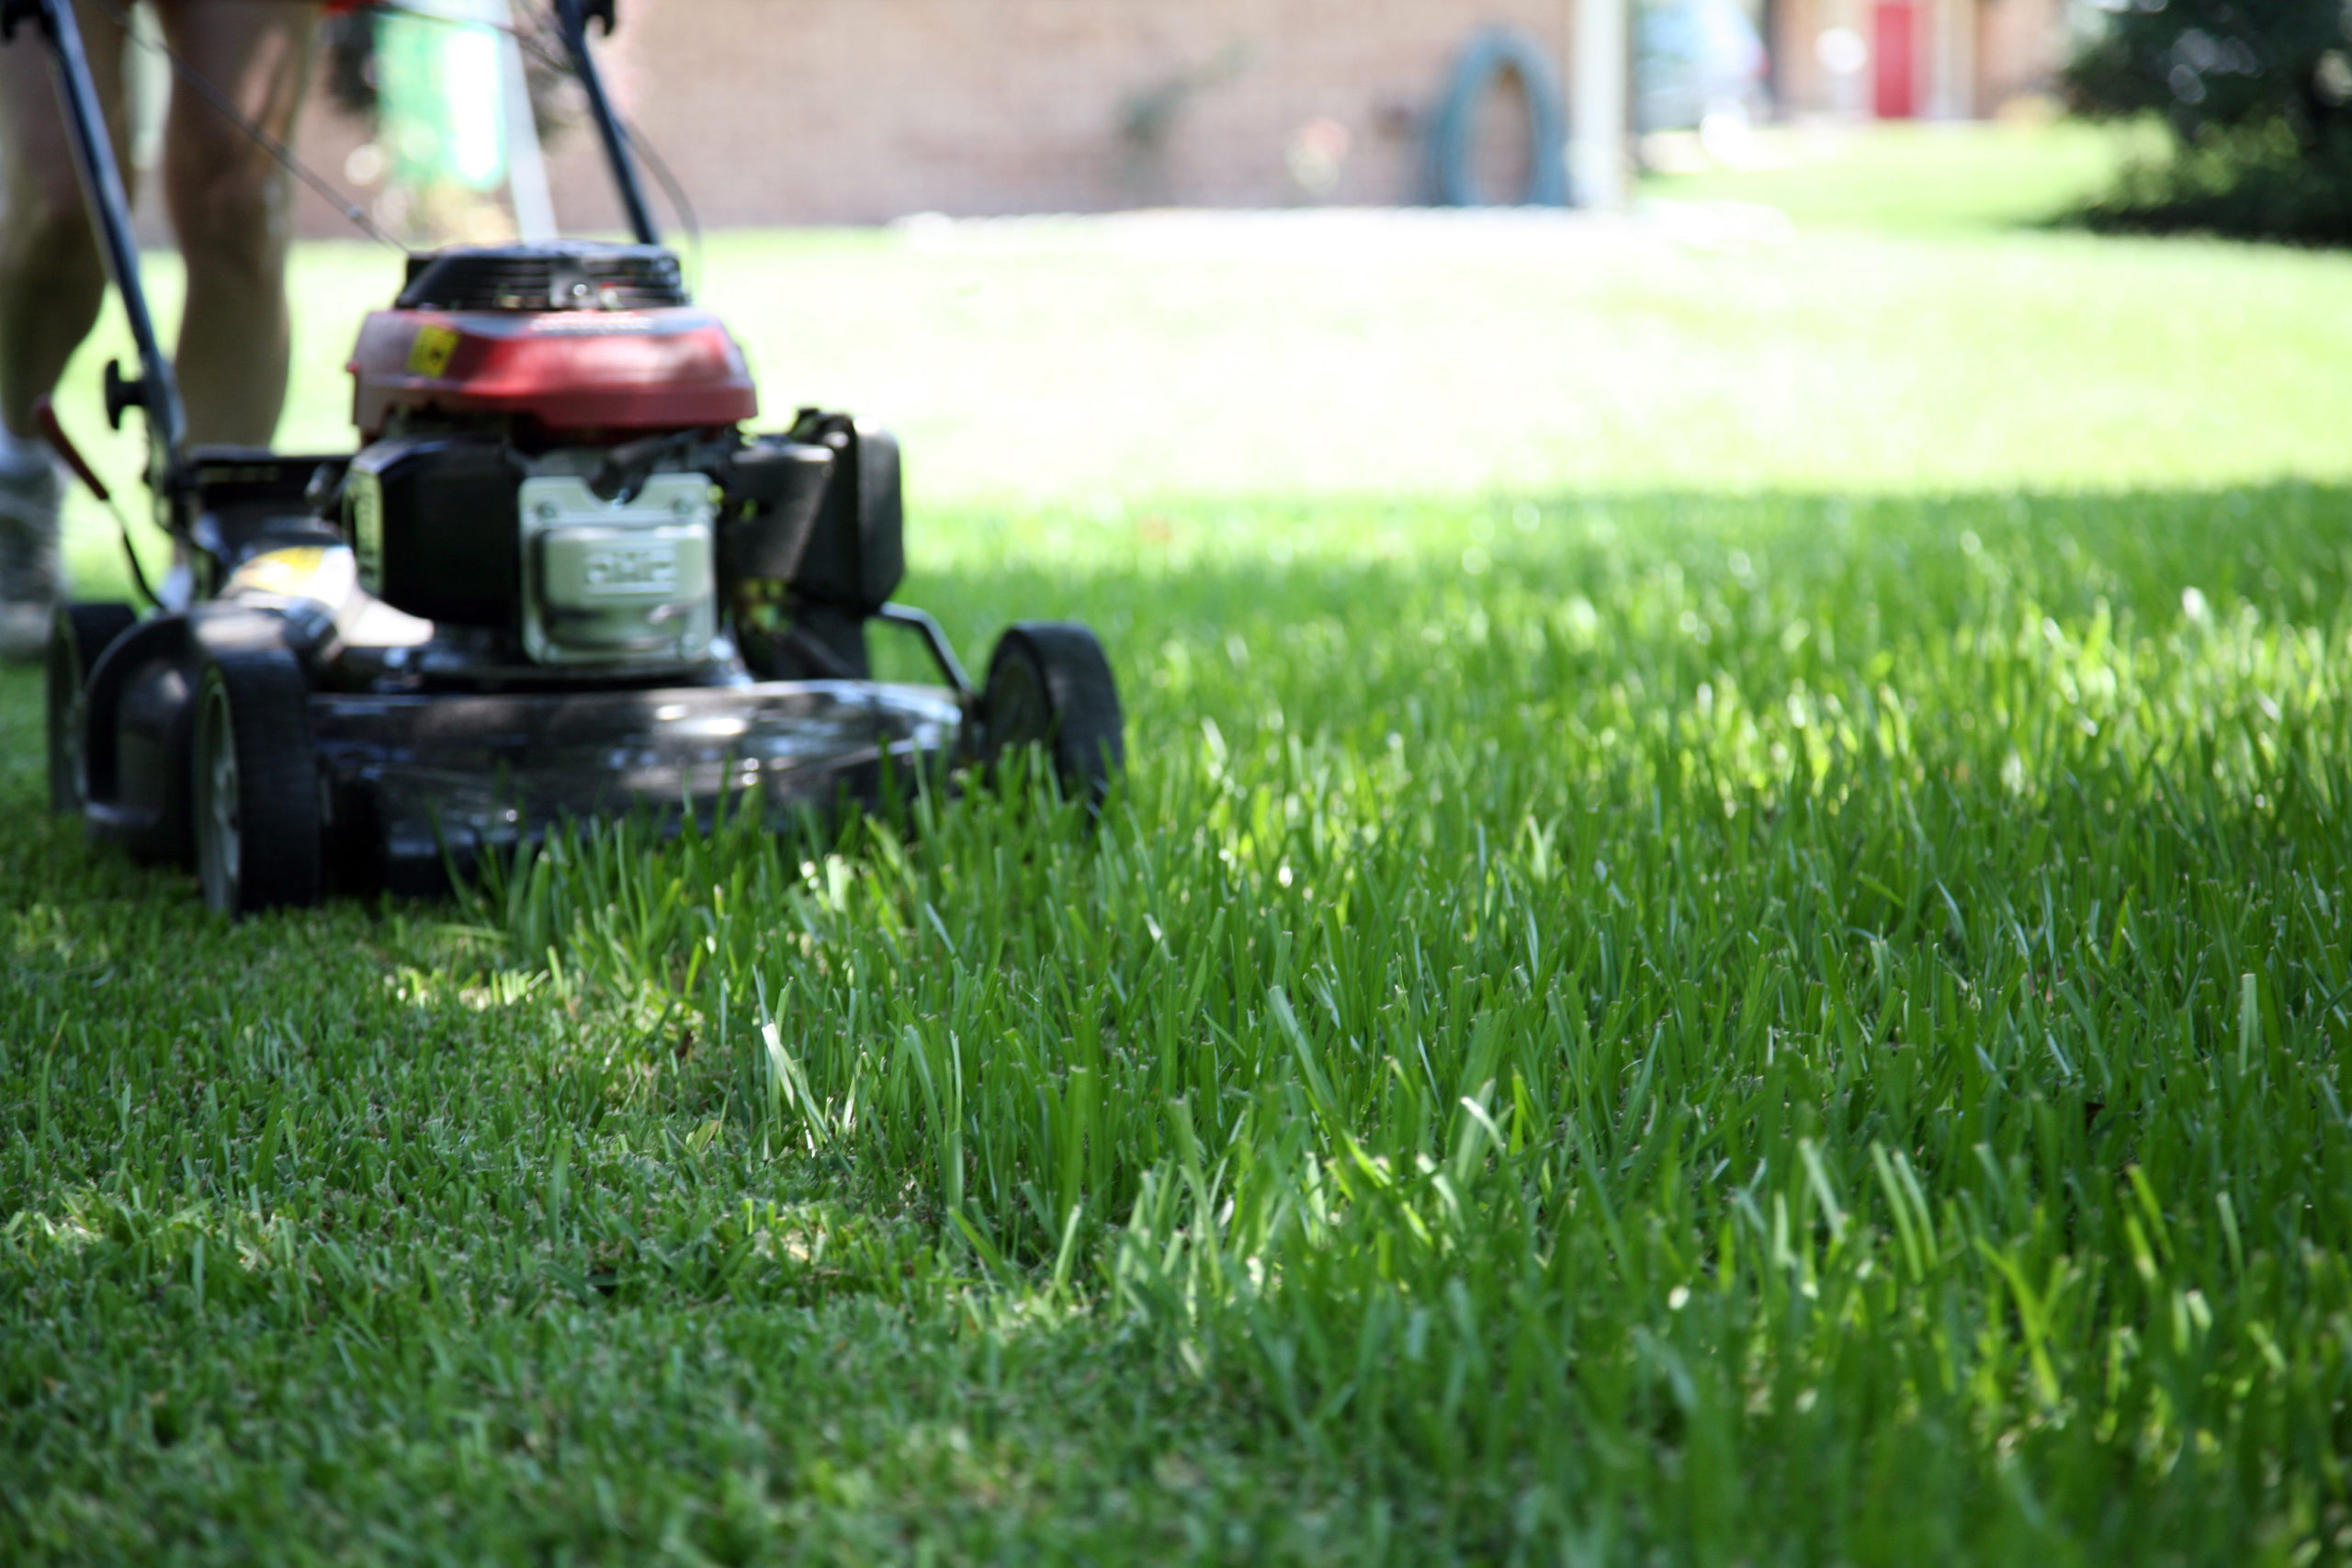 How Lawn Mower Work?